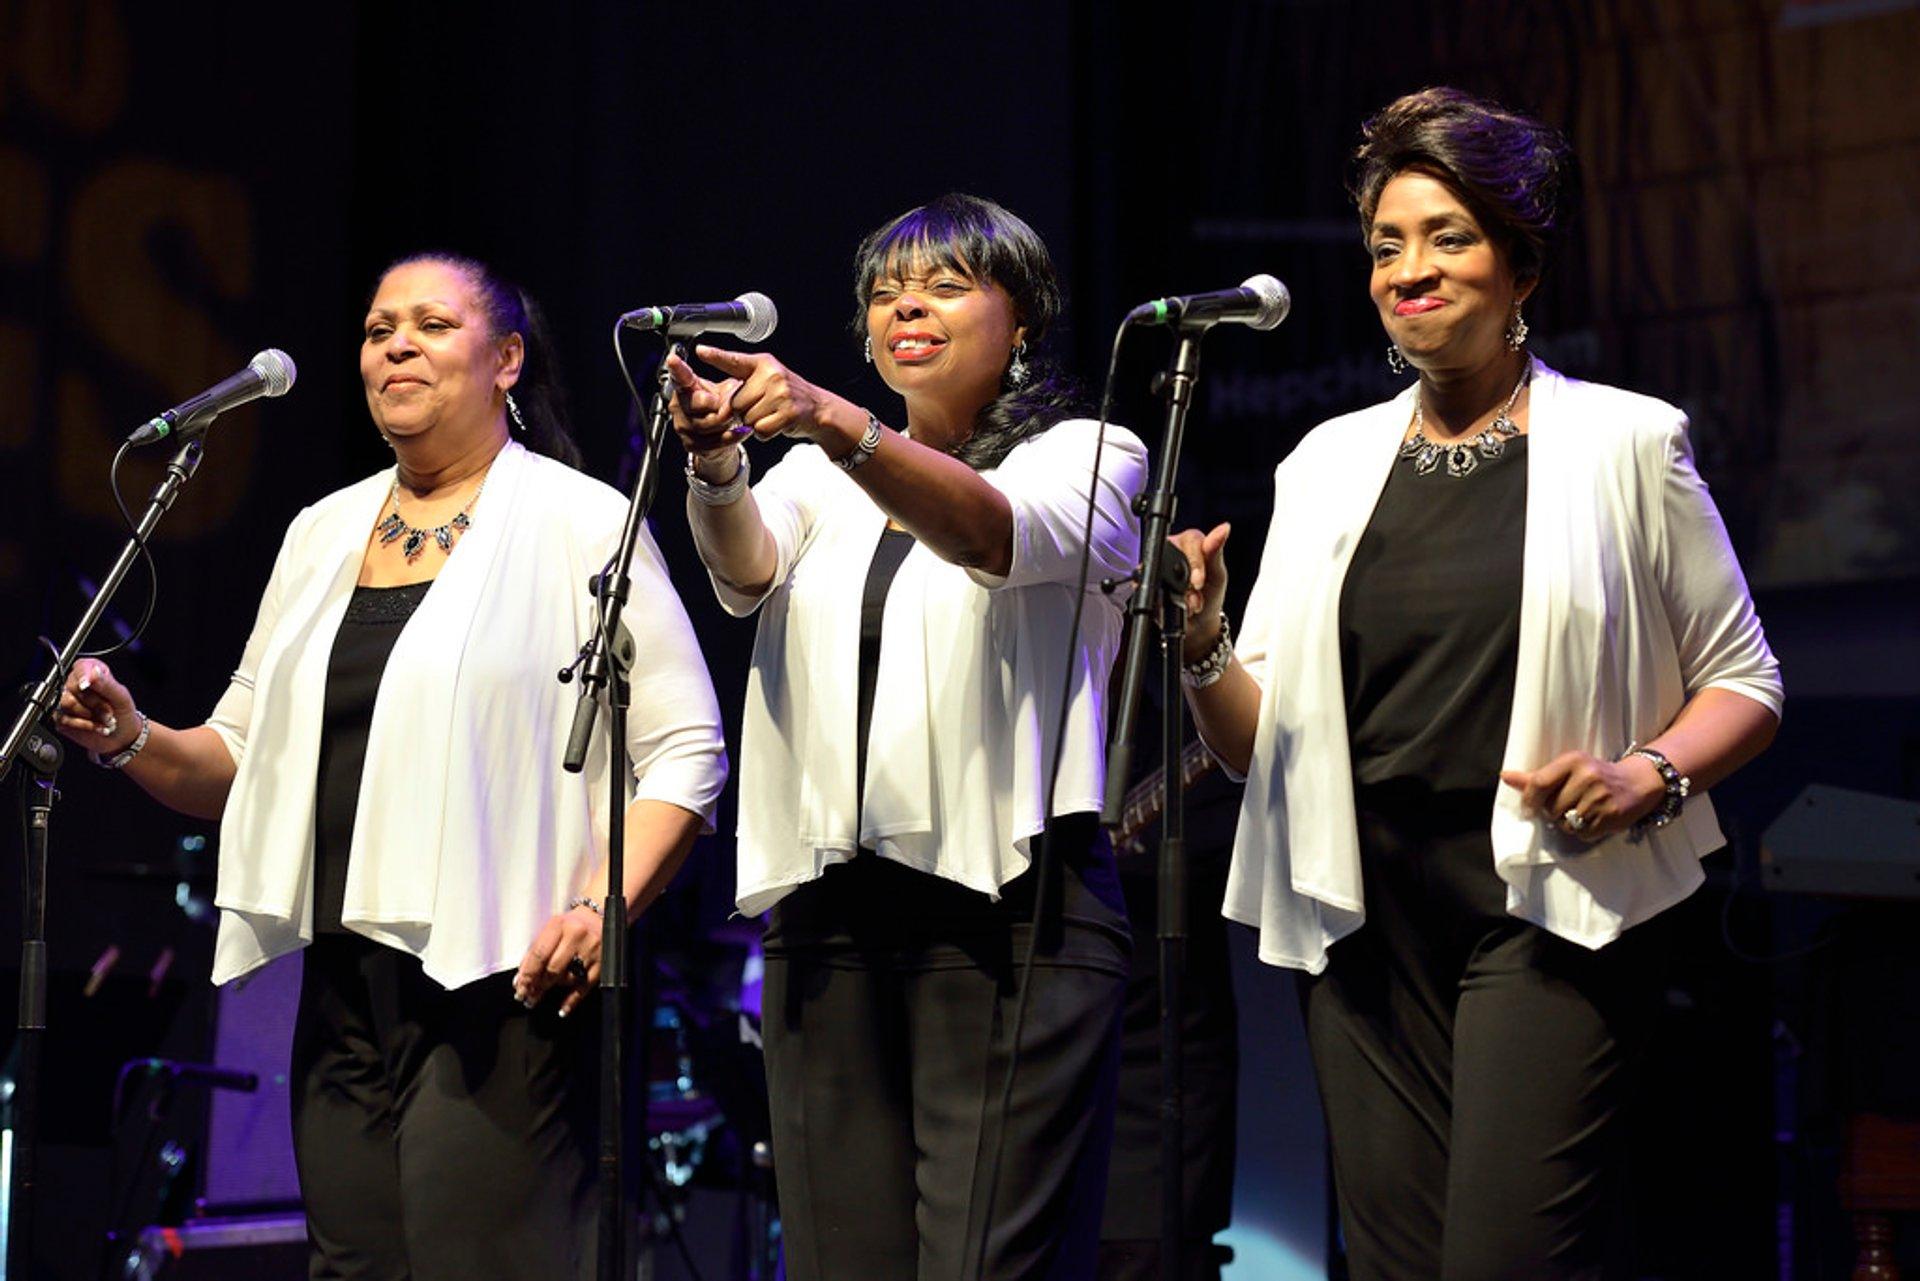 Syl Johnson's Chorus Girls 2020